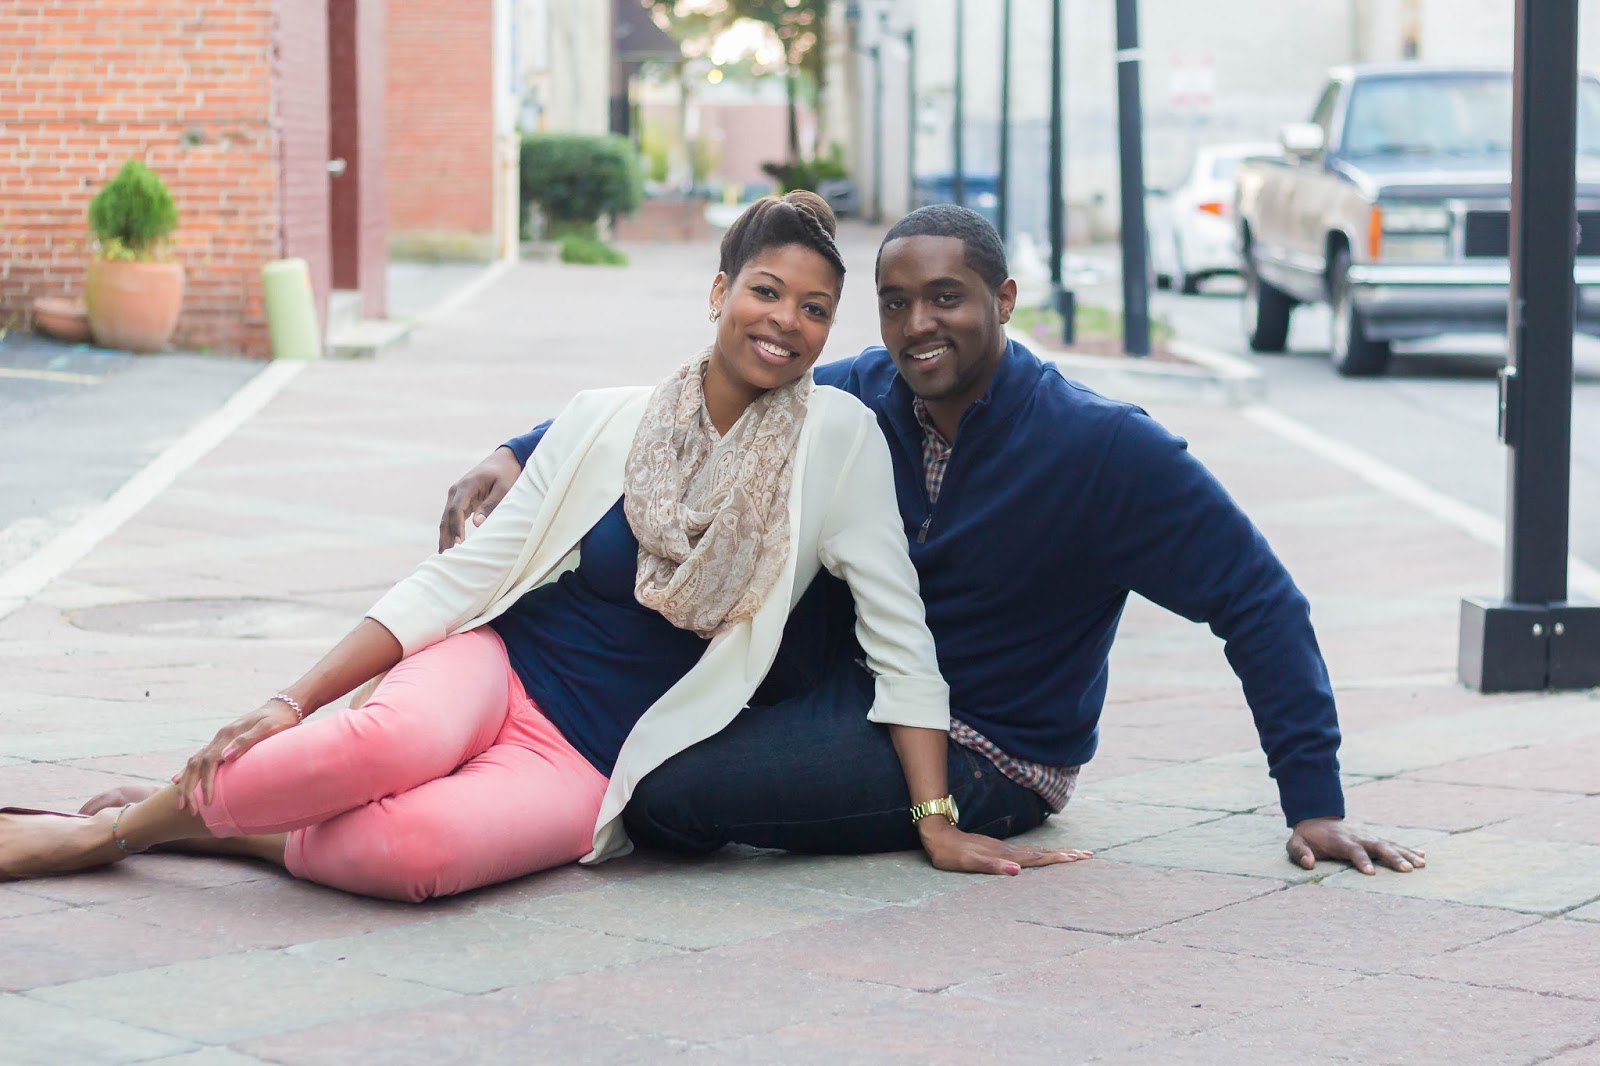 bryant-tyson-photography-mini-couples-session-greenville-nc-photographer-chris-courtney-9.jpg